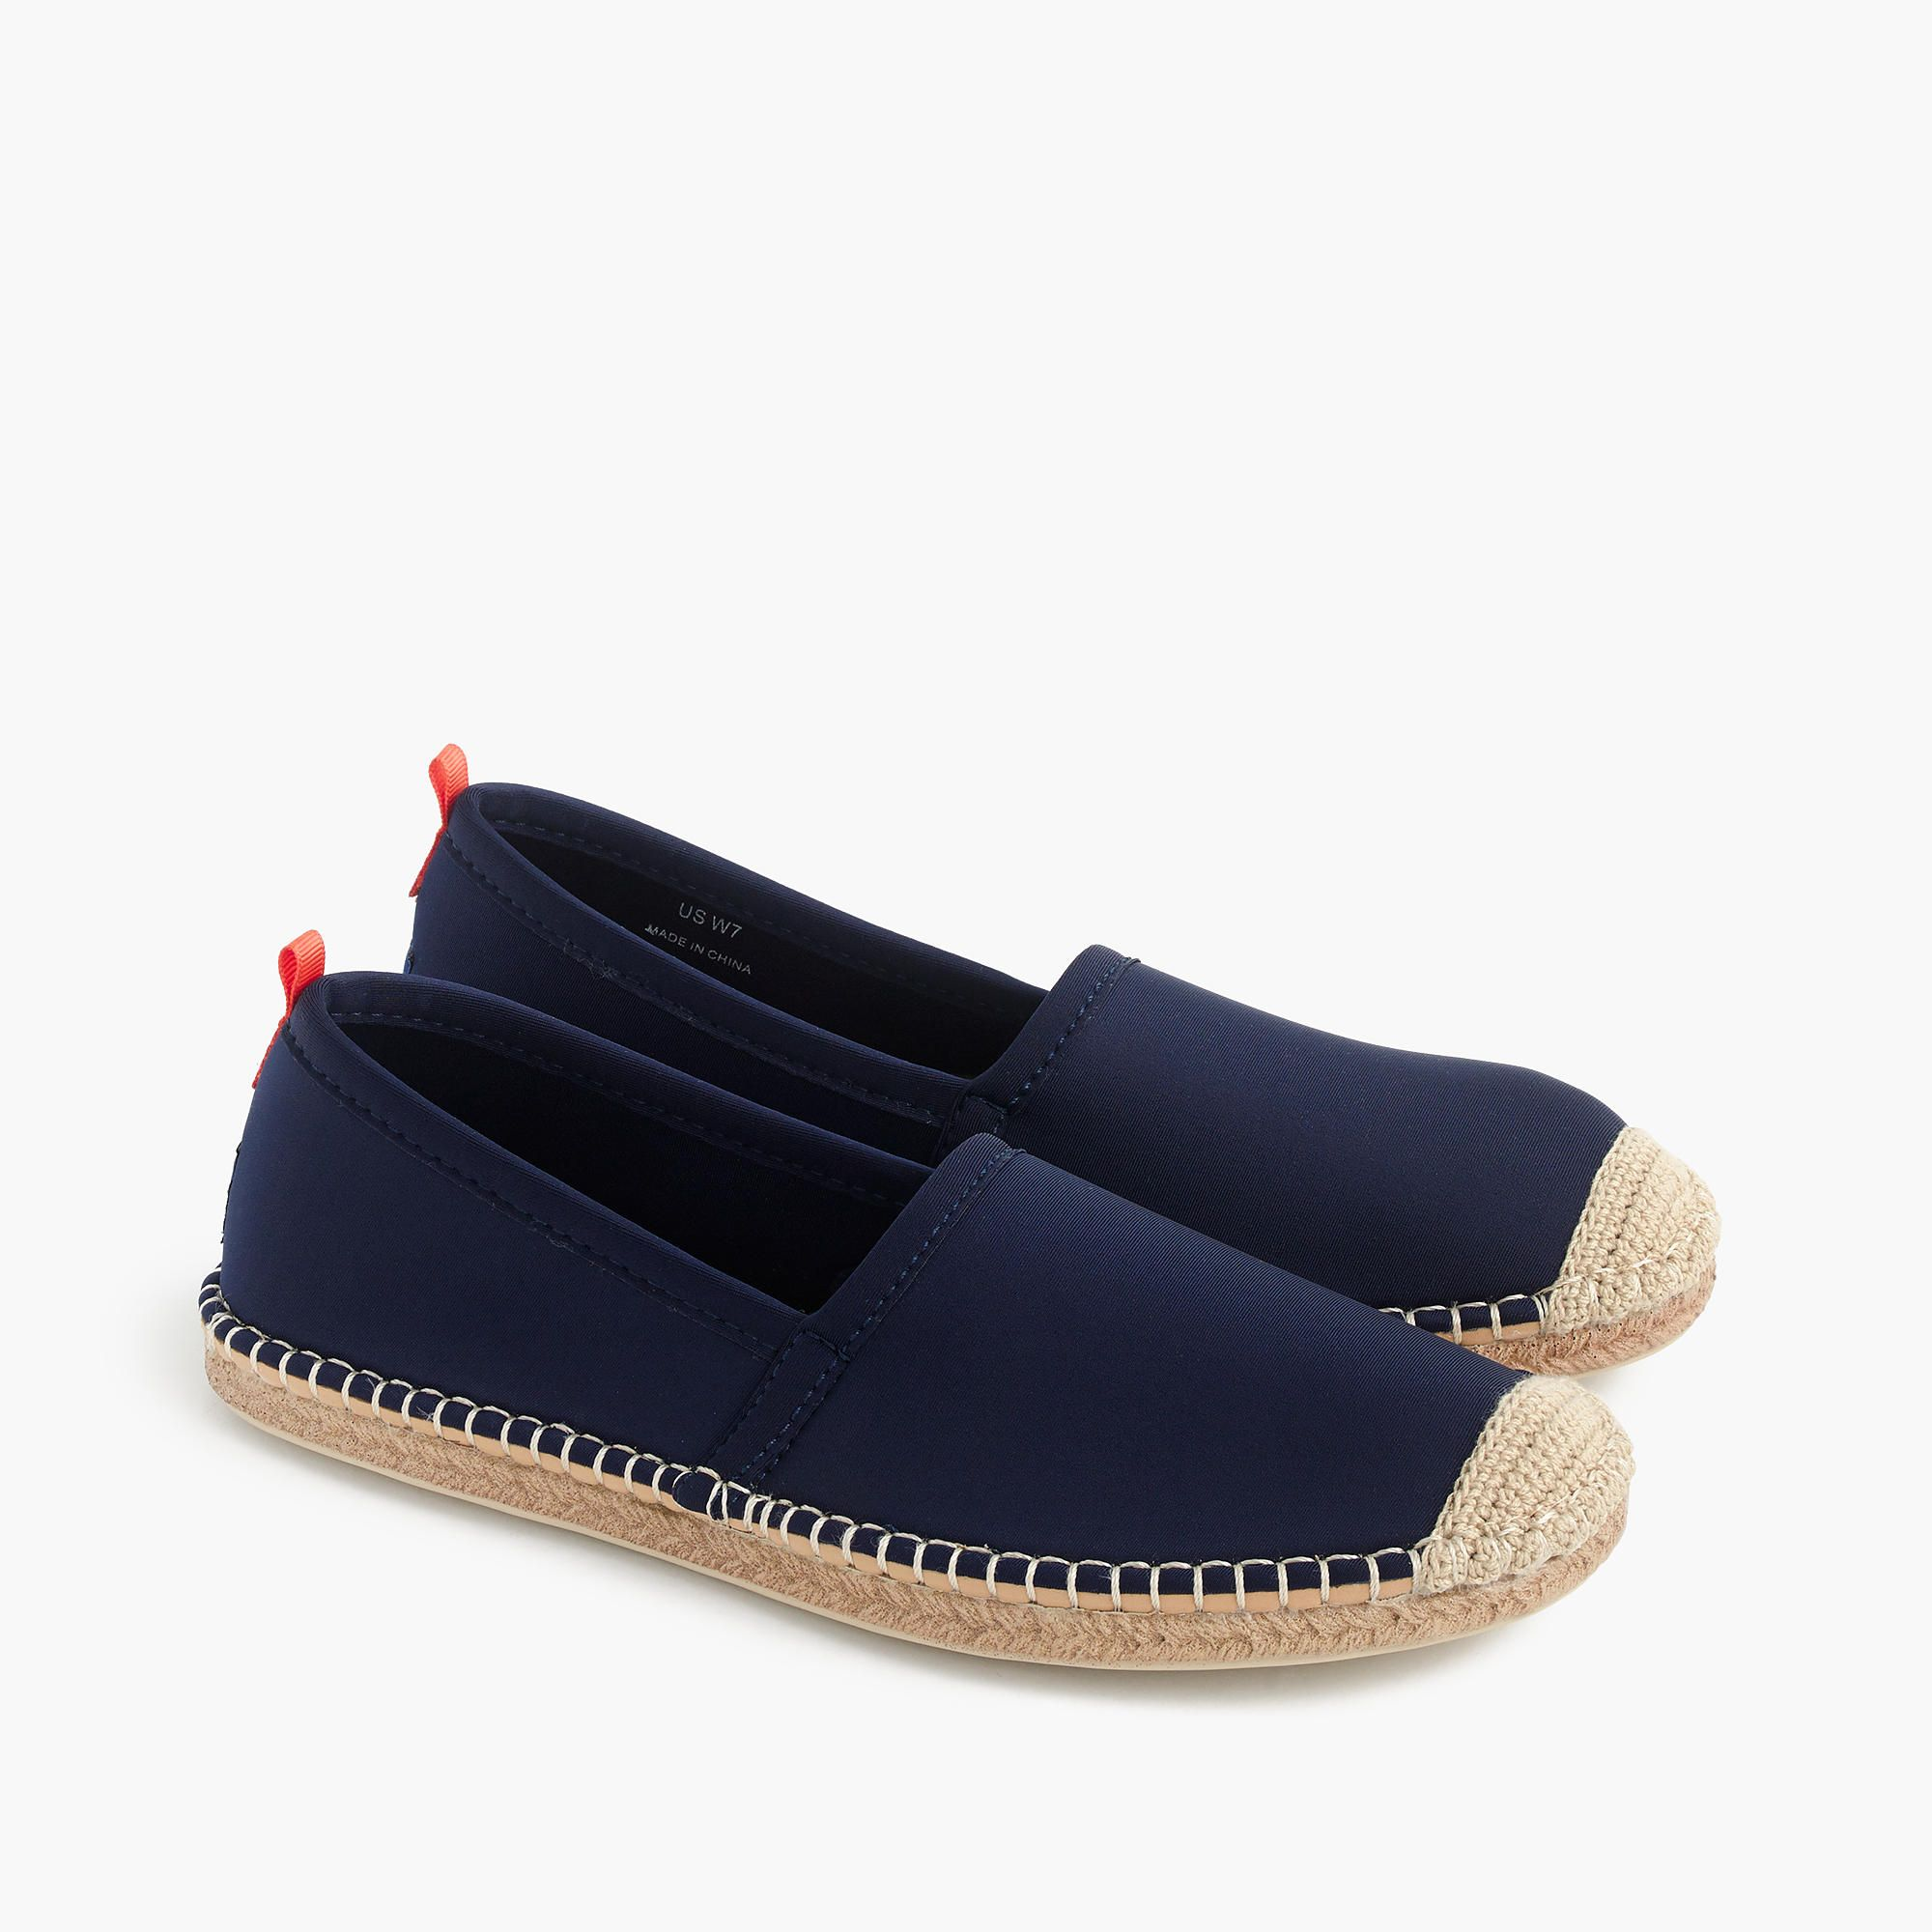 f6a4ebd07617 Sea Star Beachwear® beachcomber espadrille water shoes